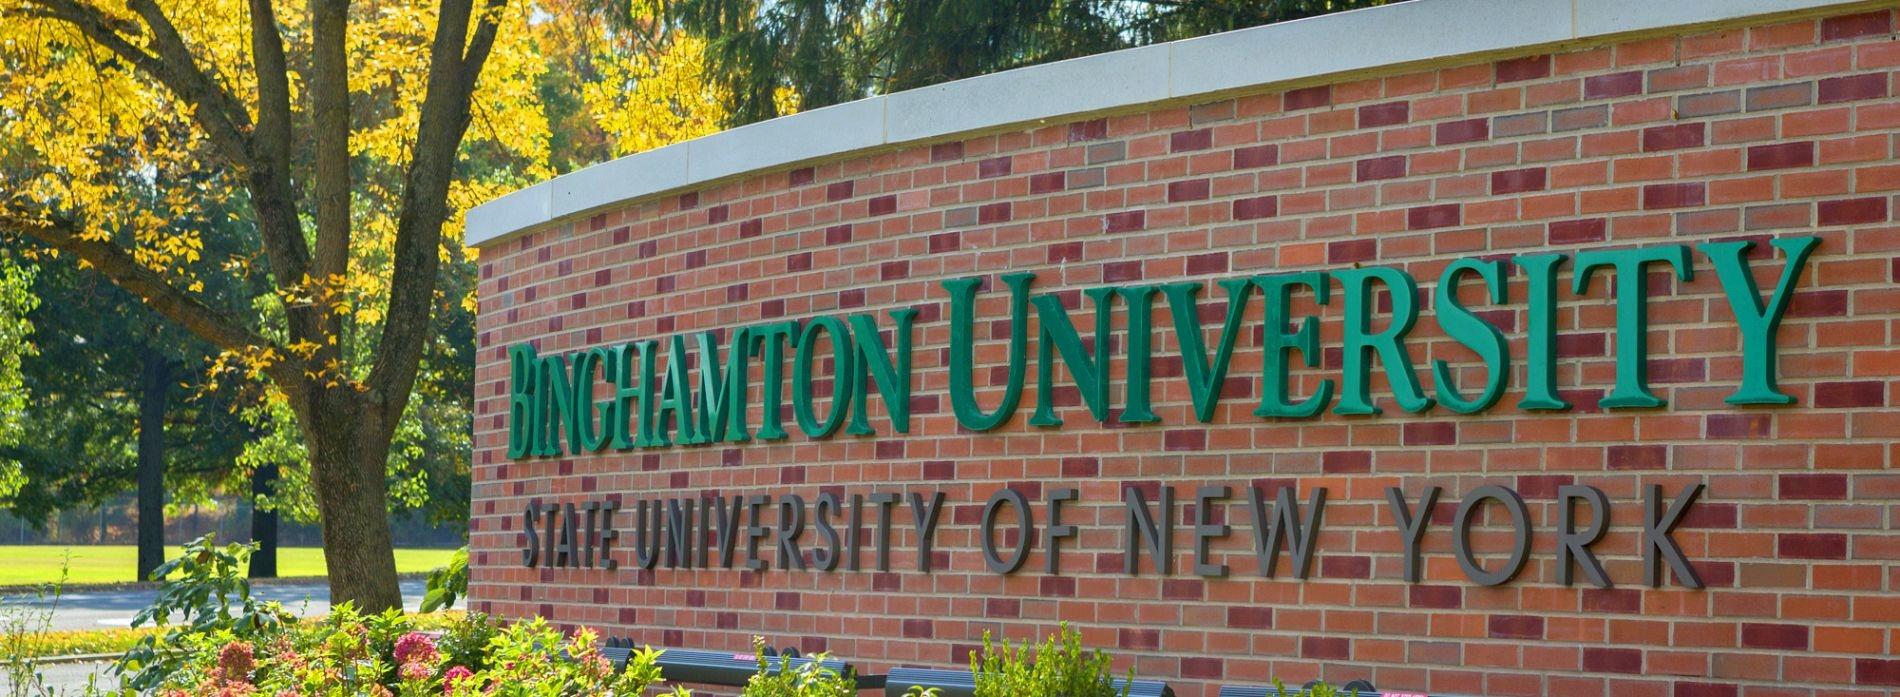 Binghamton賓漢頓大學 -紐約州排名第一的公立大學,工商管理最熱門